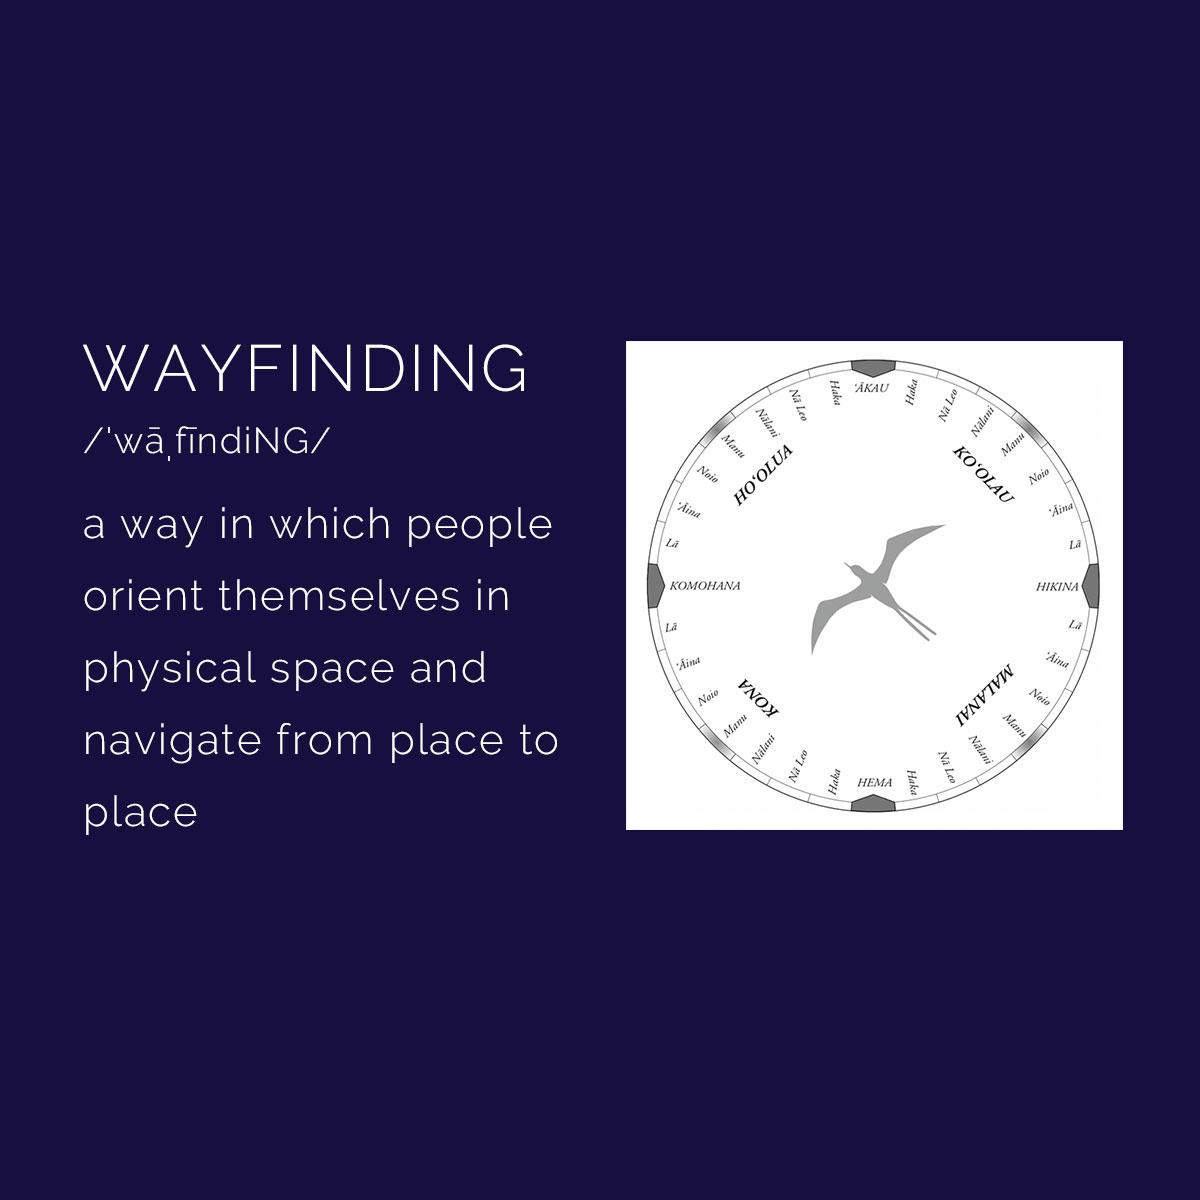 wayfinding.jpg